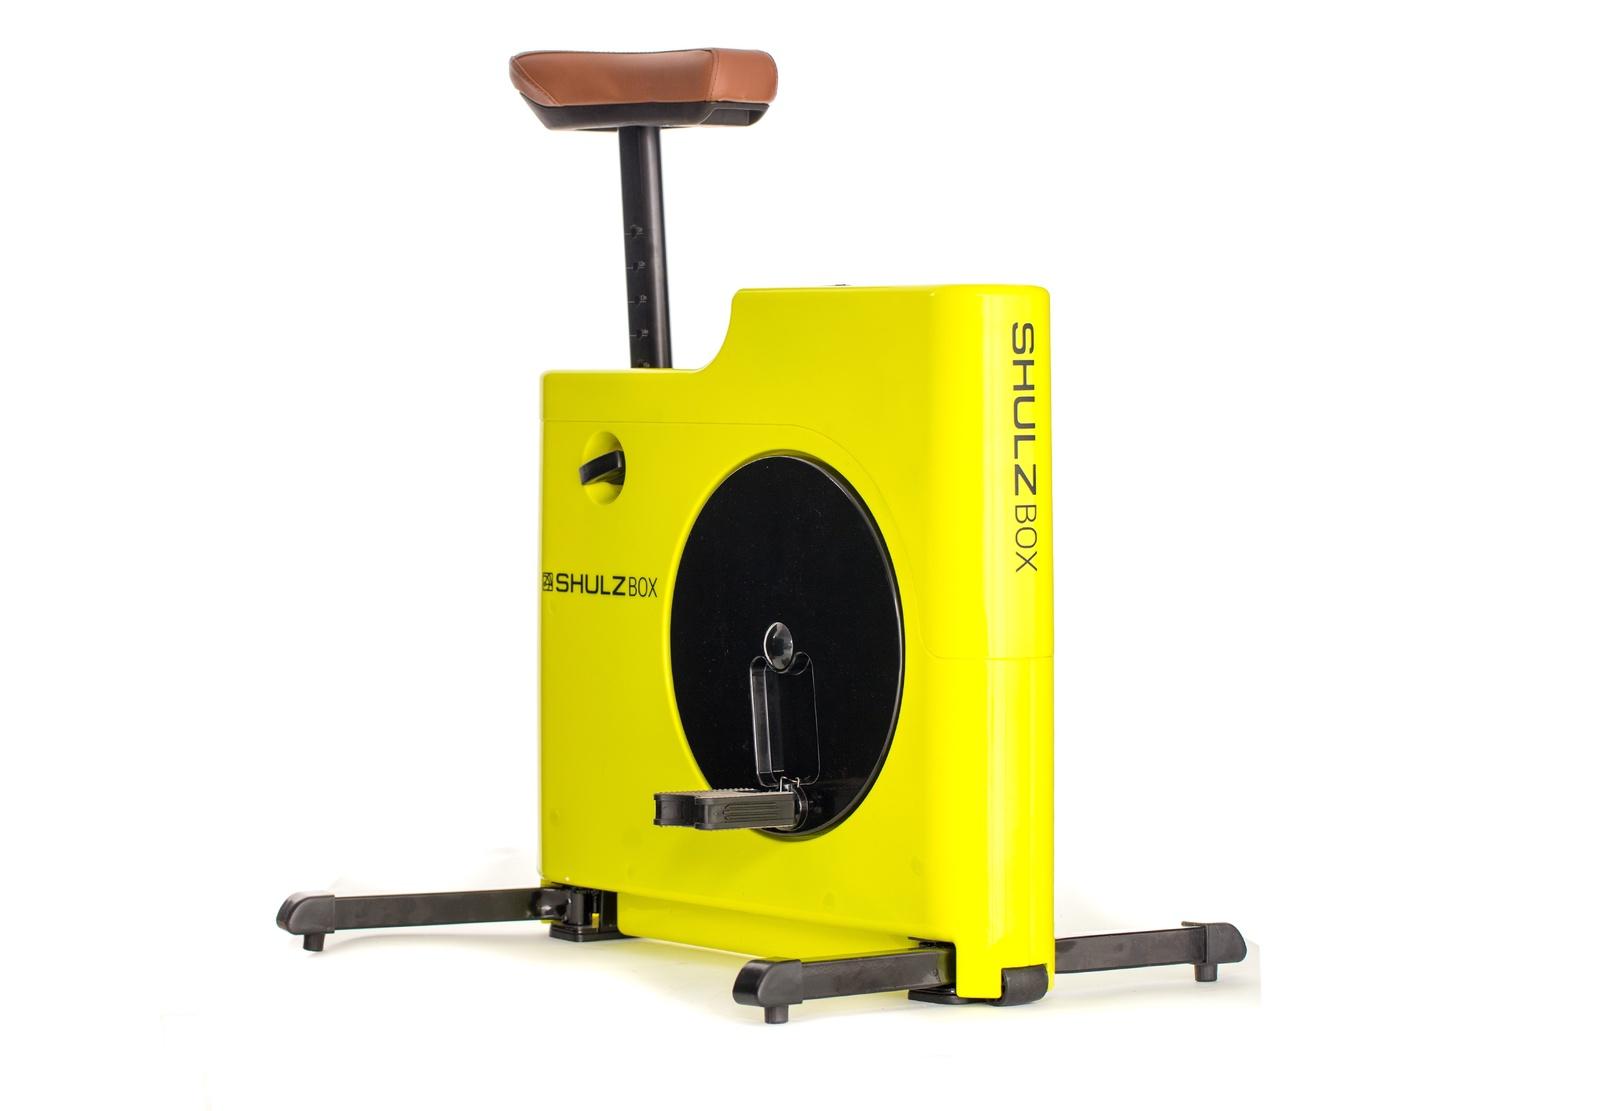 Велотренажер компактный SHULZBOX, желтый